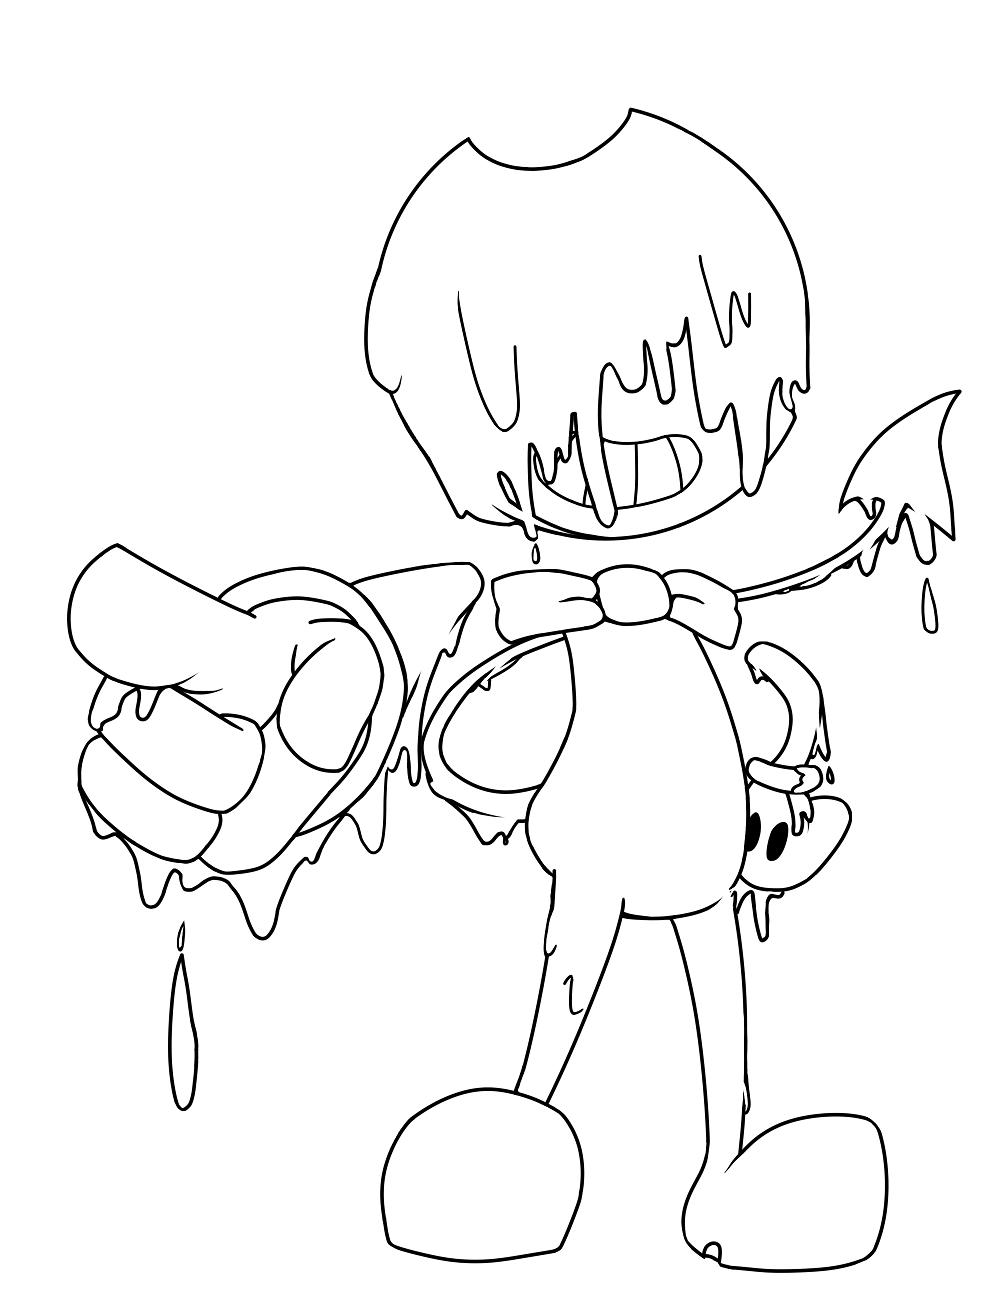 Bendy Melting